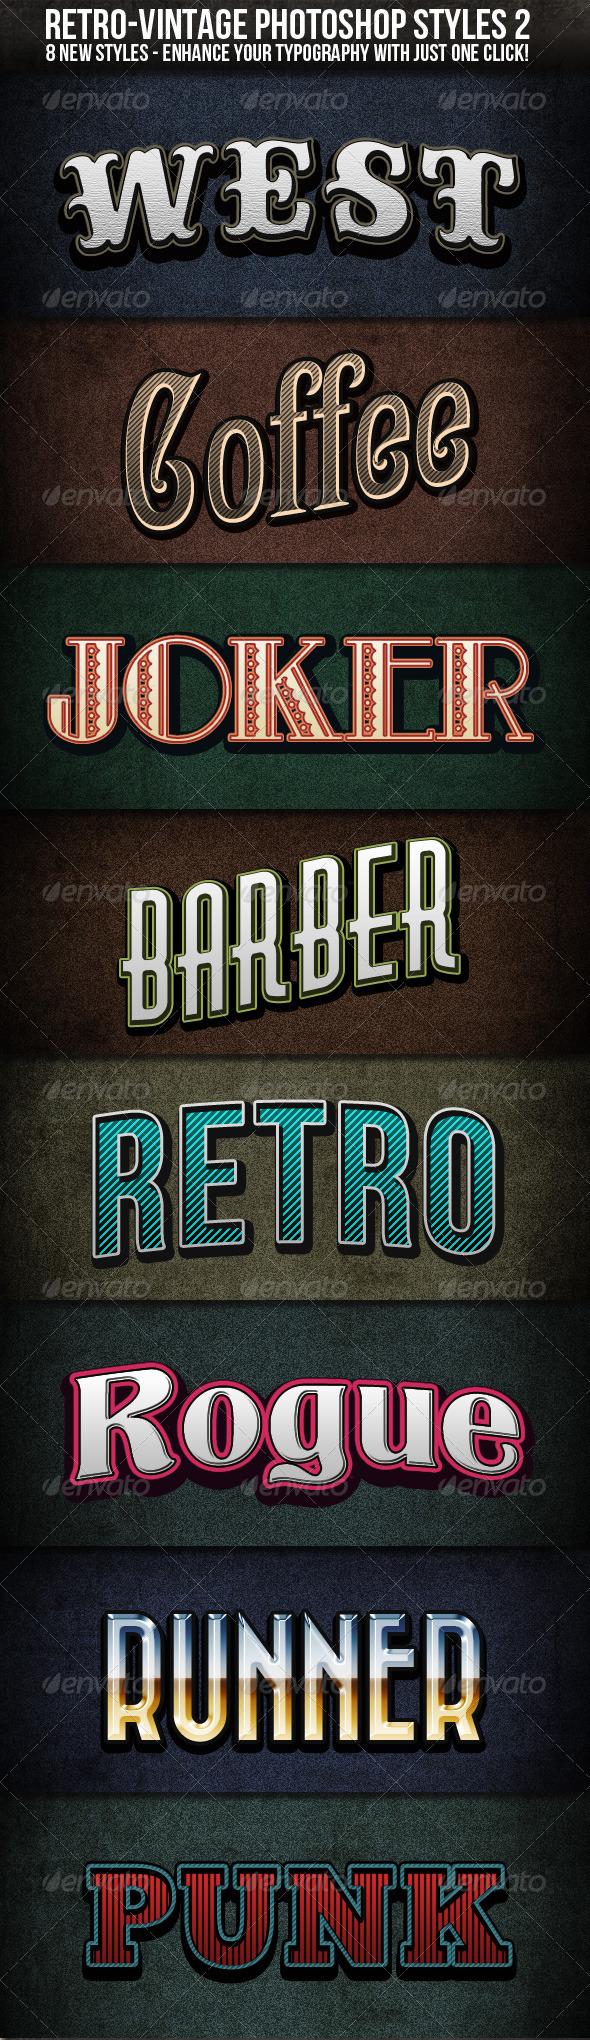 GraphicRiver Retro-Vintage Styles 2 541891